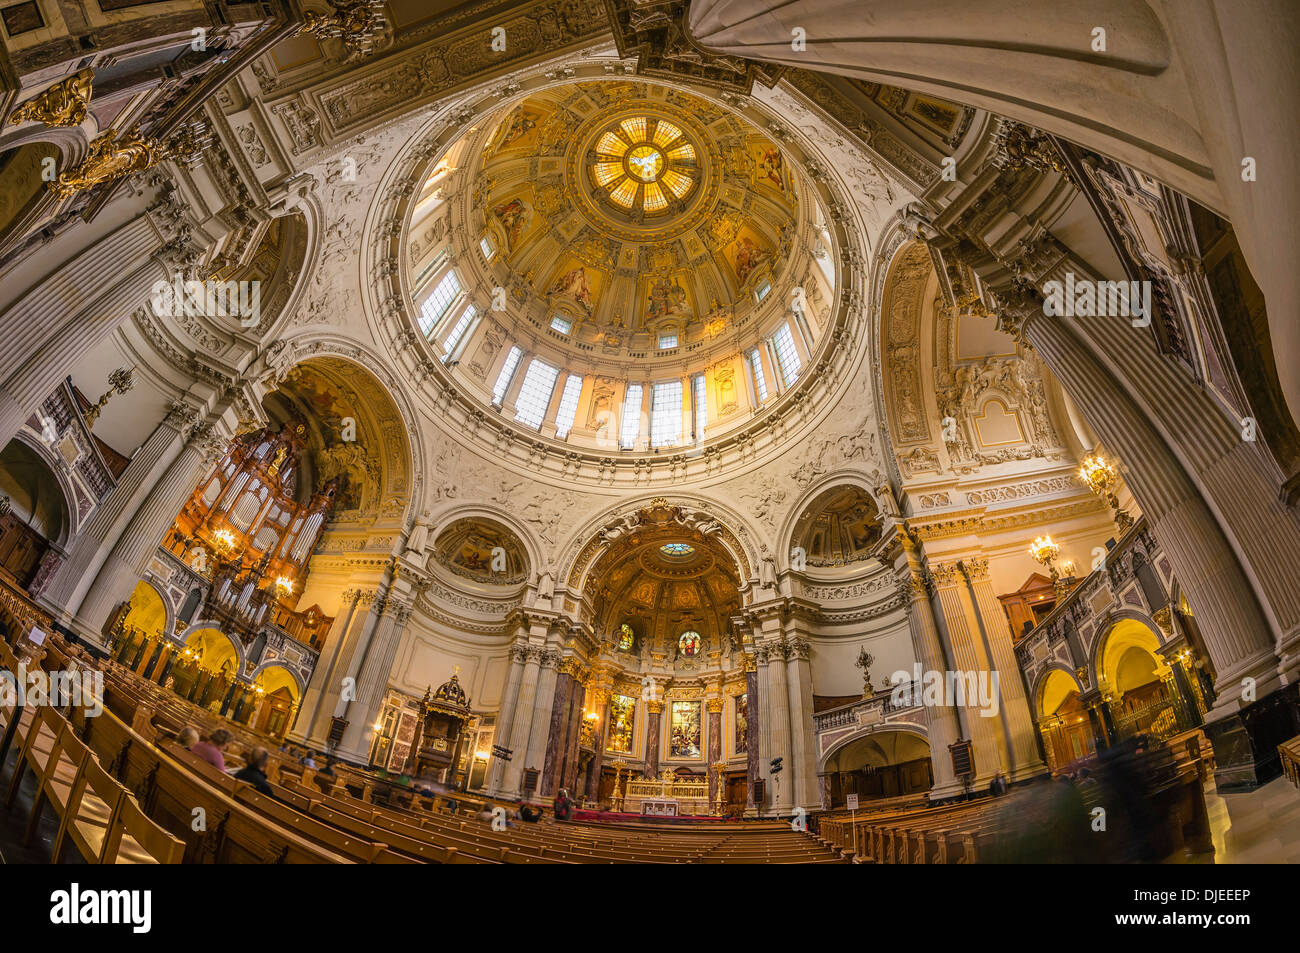 Dome interieur, cúpula, Berlín, Alemania Foto de stock